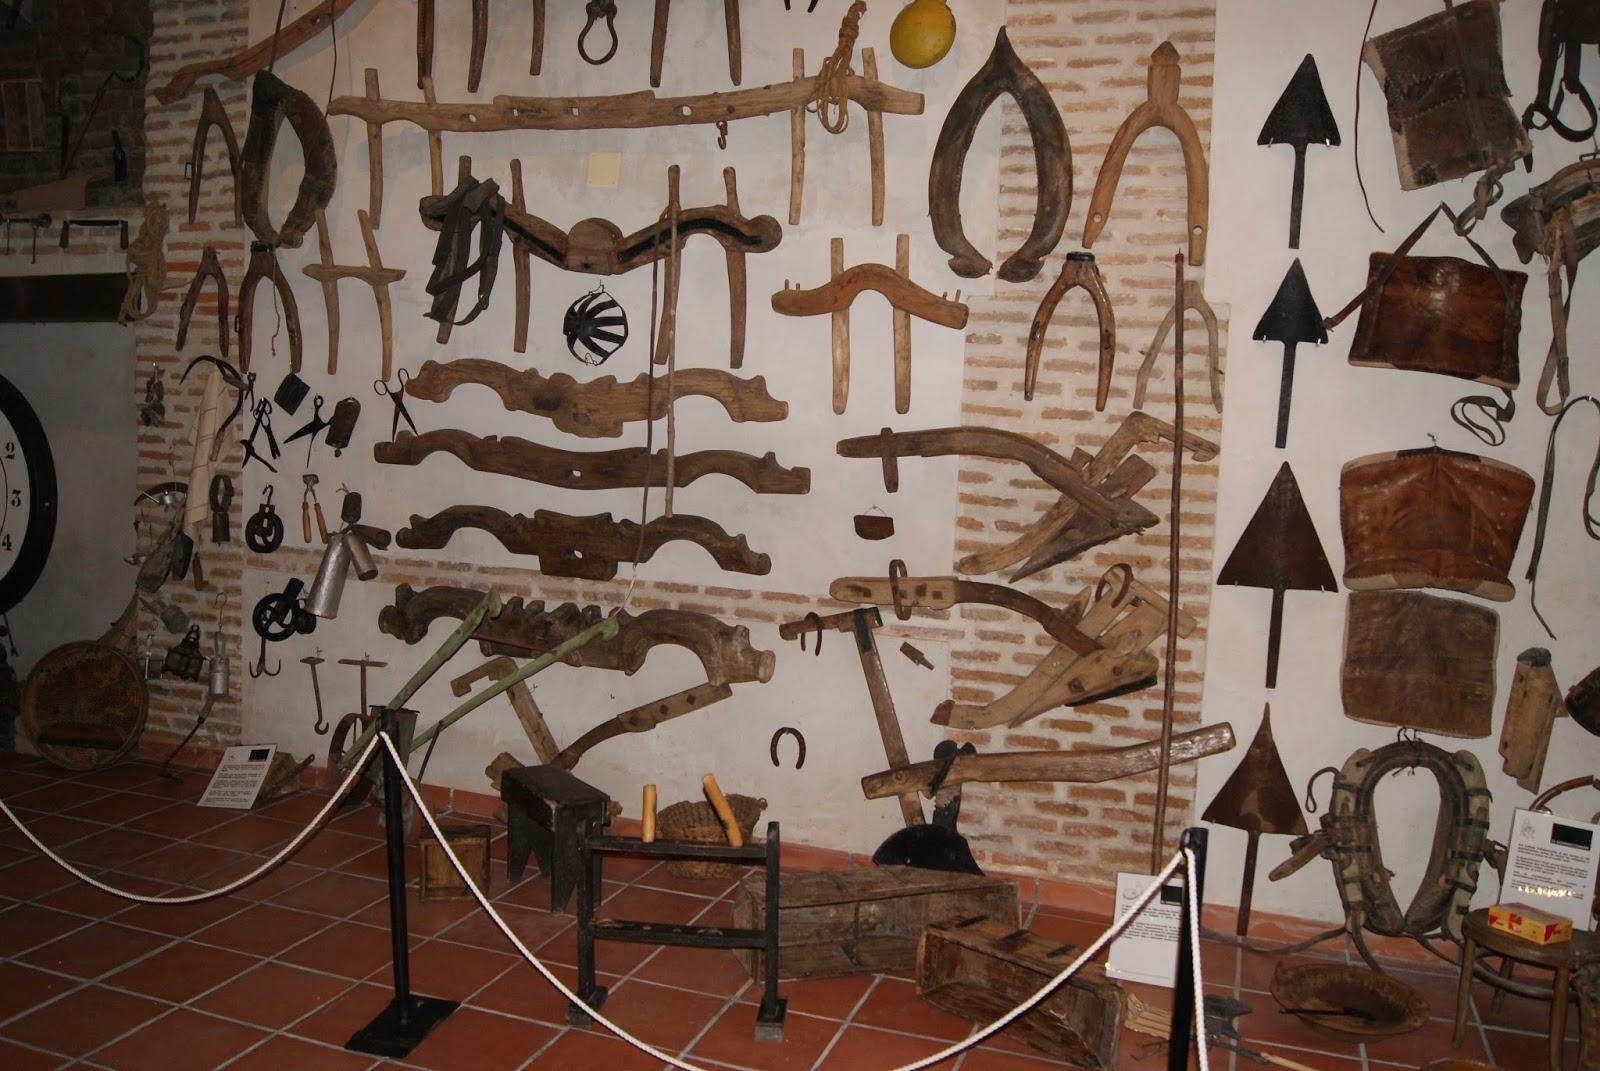 Museo etnogr fico de anta o a hoga o museo - Aperos agricolas antiguos ...